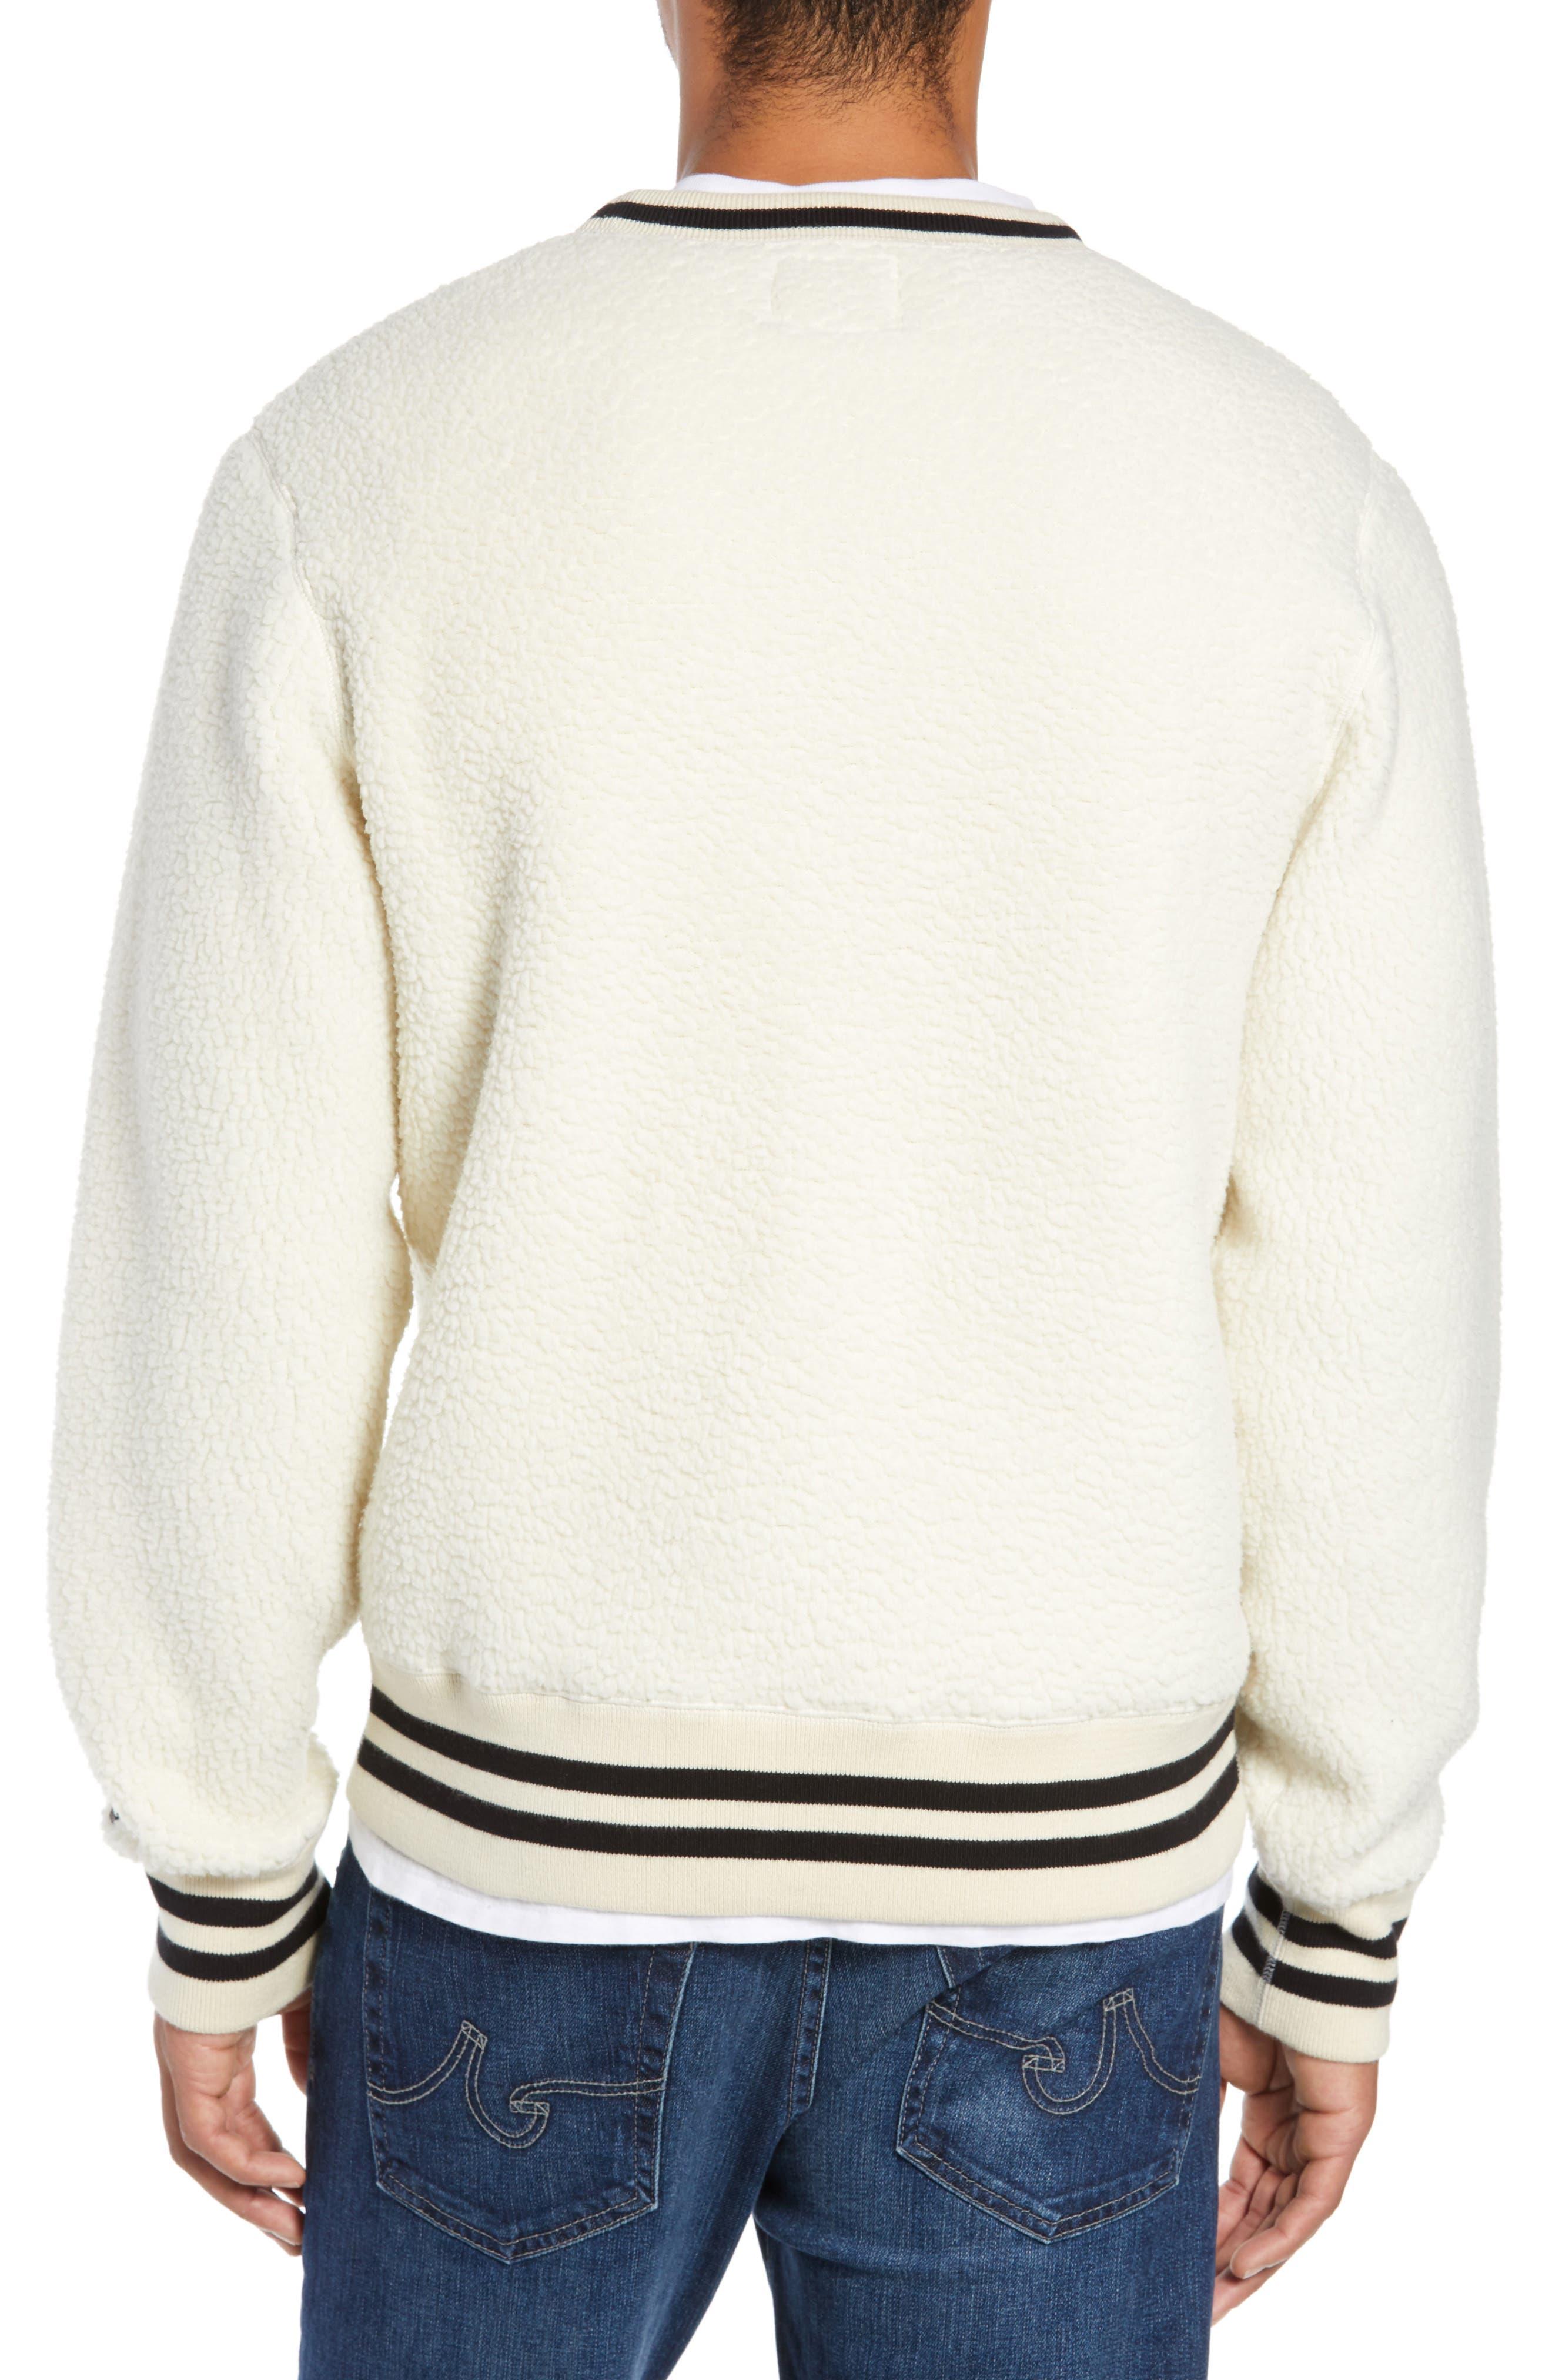 + Champion Fleece Crewneck Sweatshirt,                             Alternate thumbnail 2, color,                             900